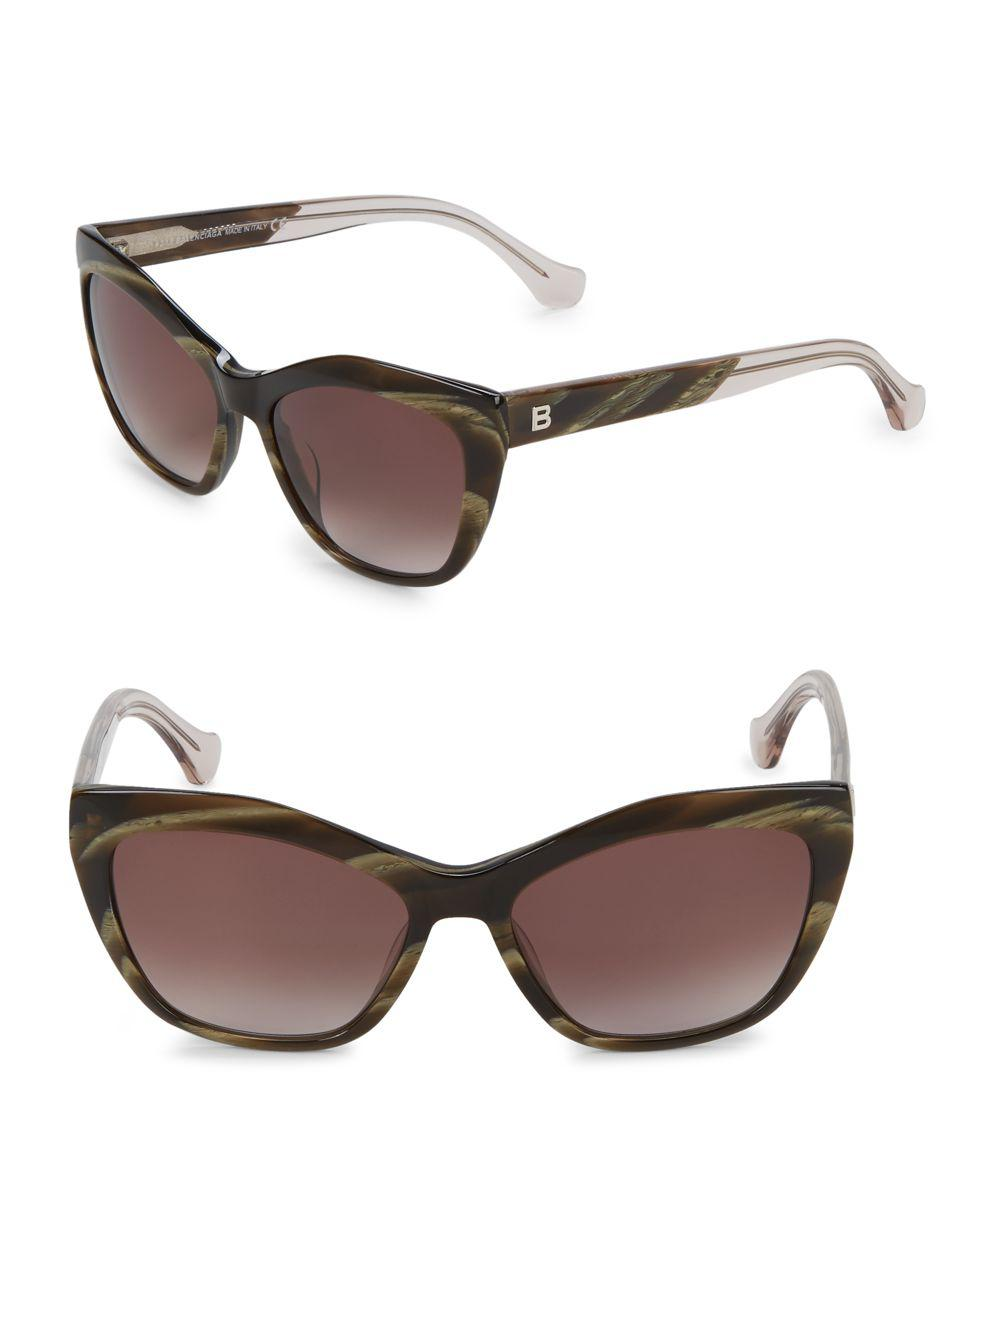 a4812b65253 Lyst - Balenciaga 56mm Square Sunglasses in Brown